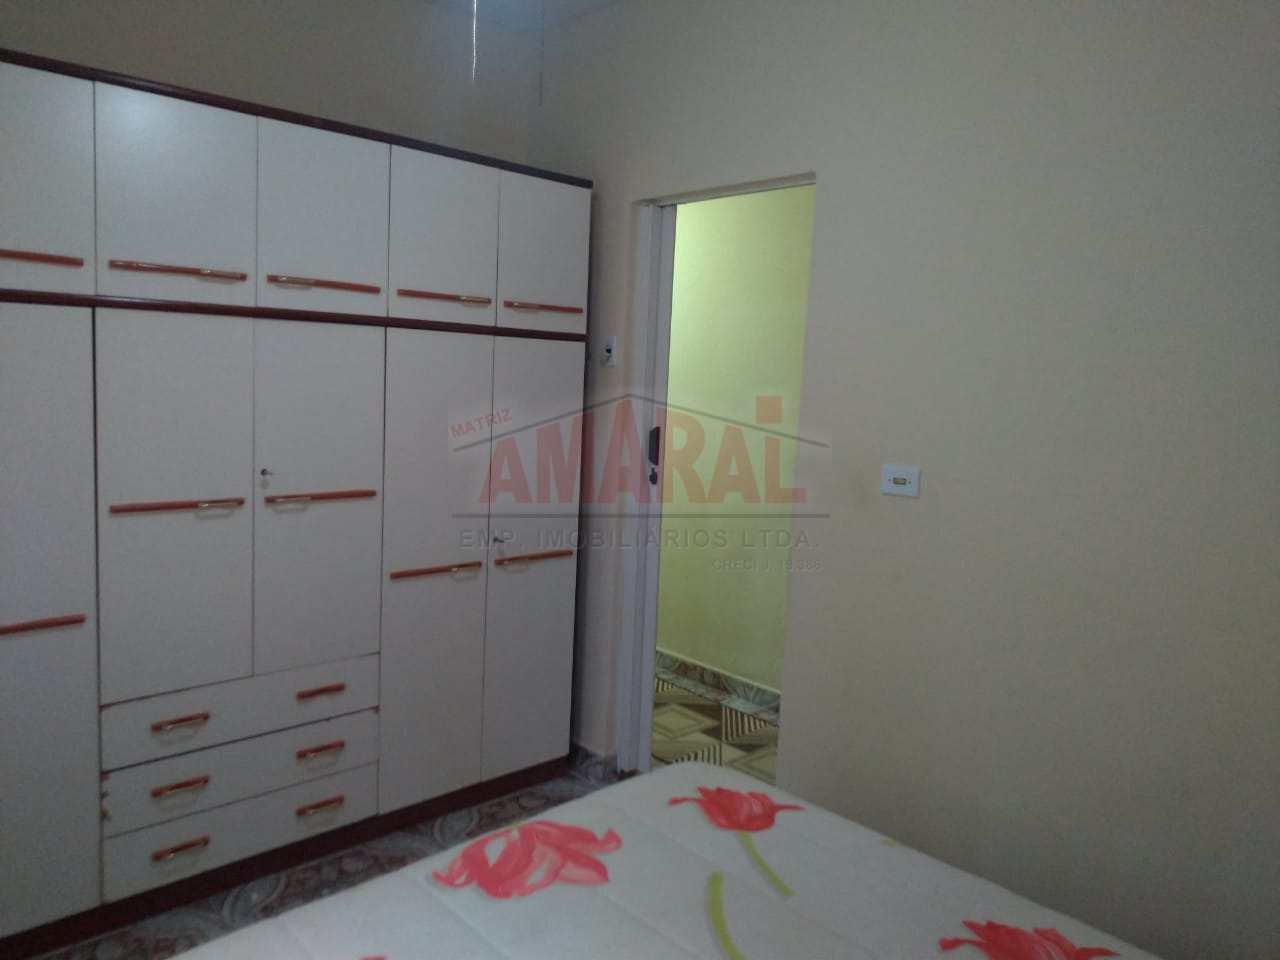 Casa com 3 dorms, Jardim Vera Cruz(Zona Leste), São Paulo - R$ 370 mil, Cod: 11328